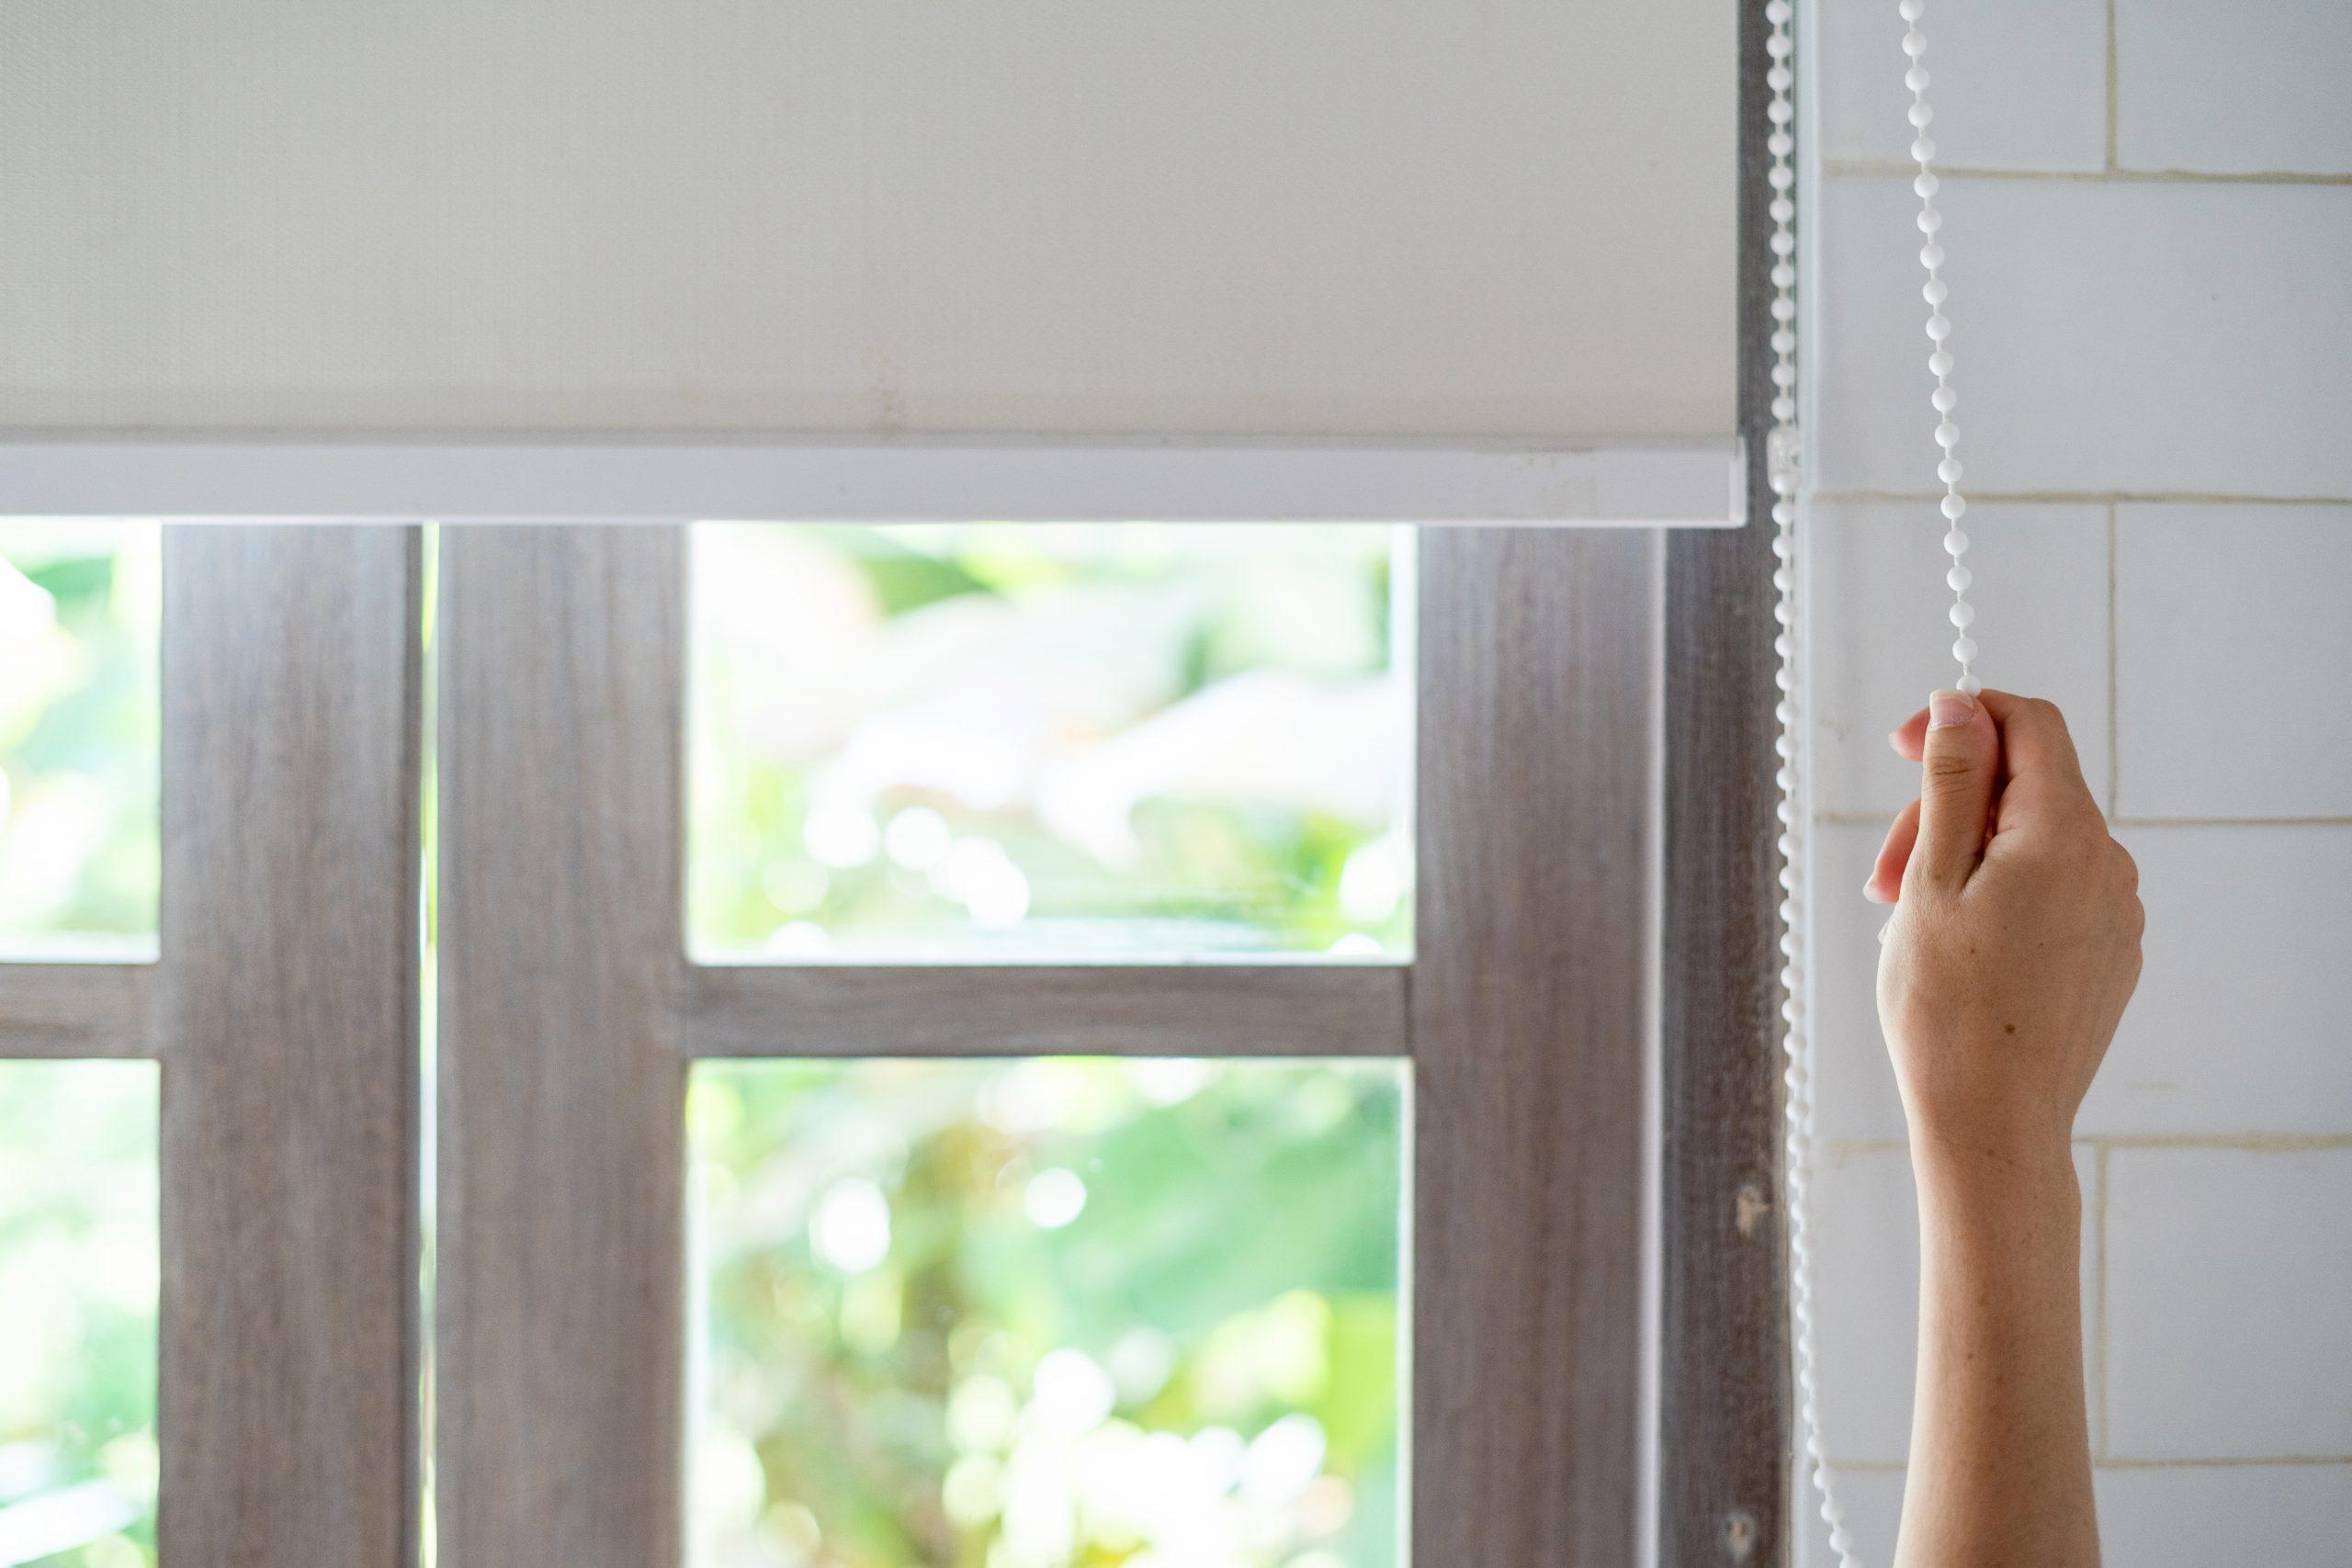 latkove rolety tienenie interier okno